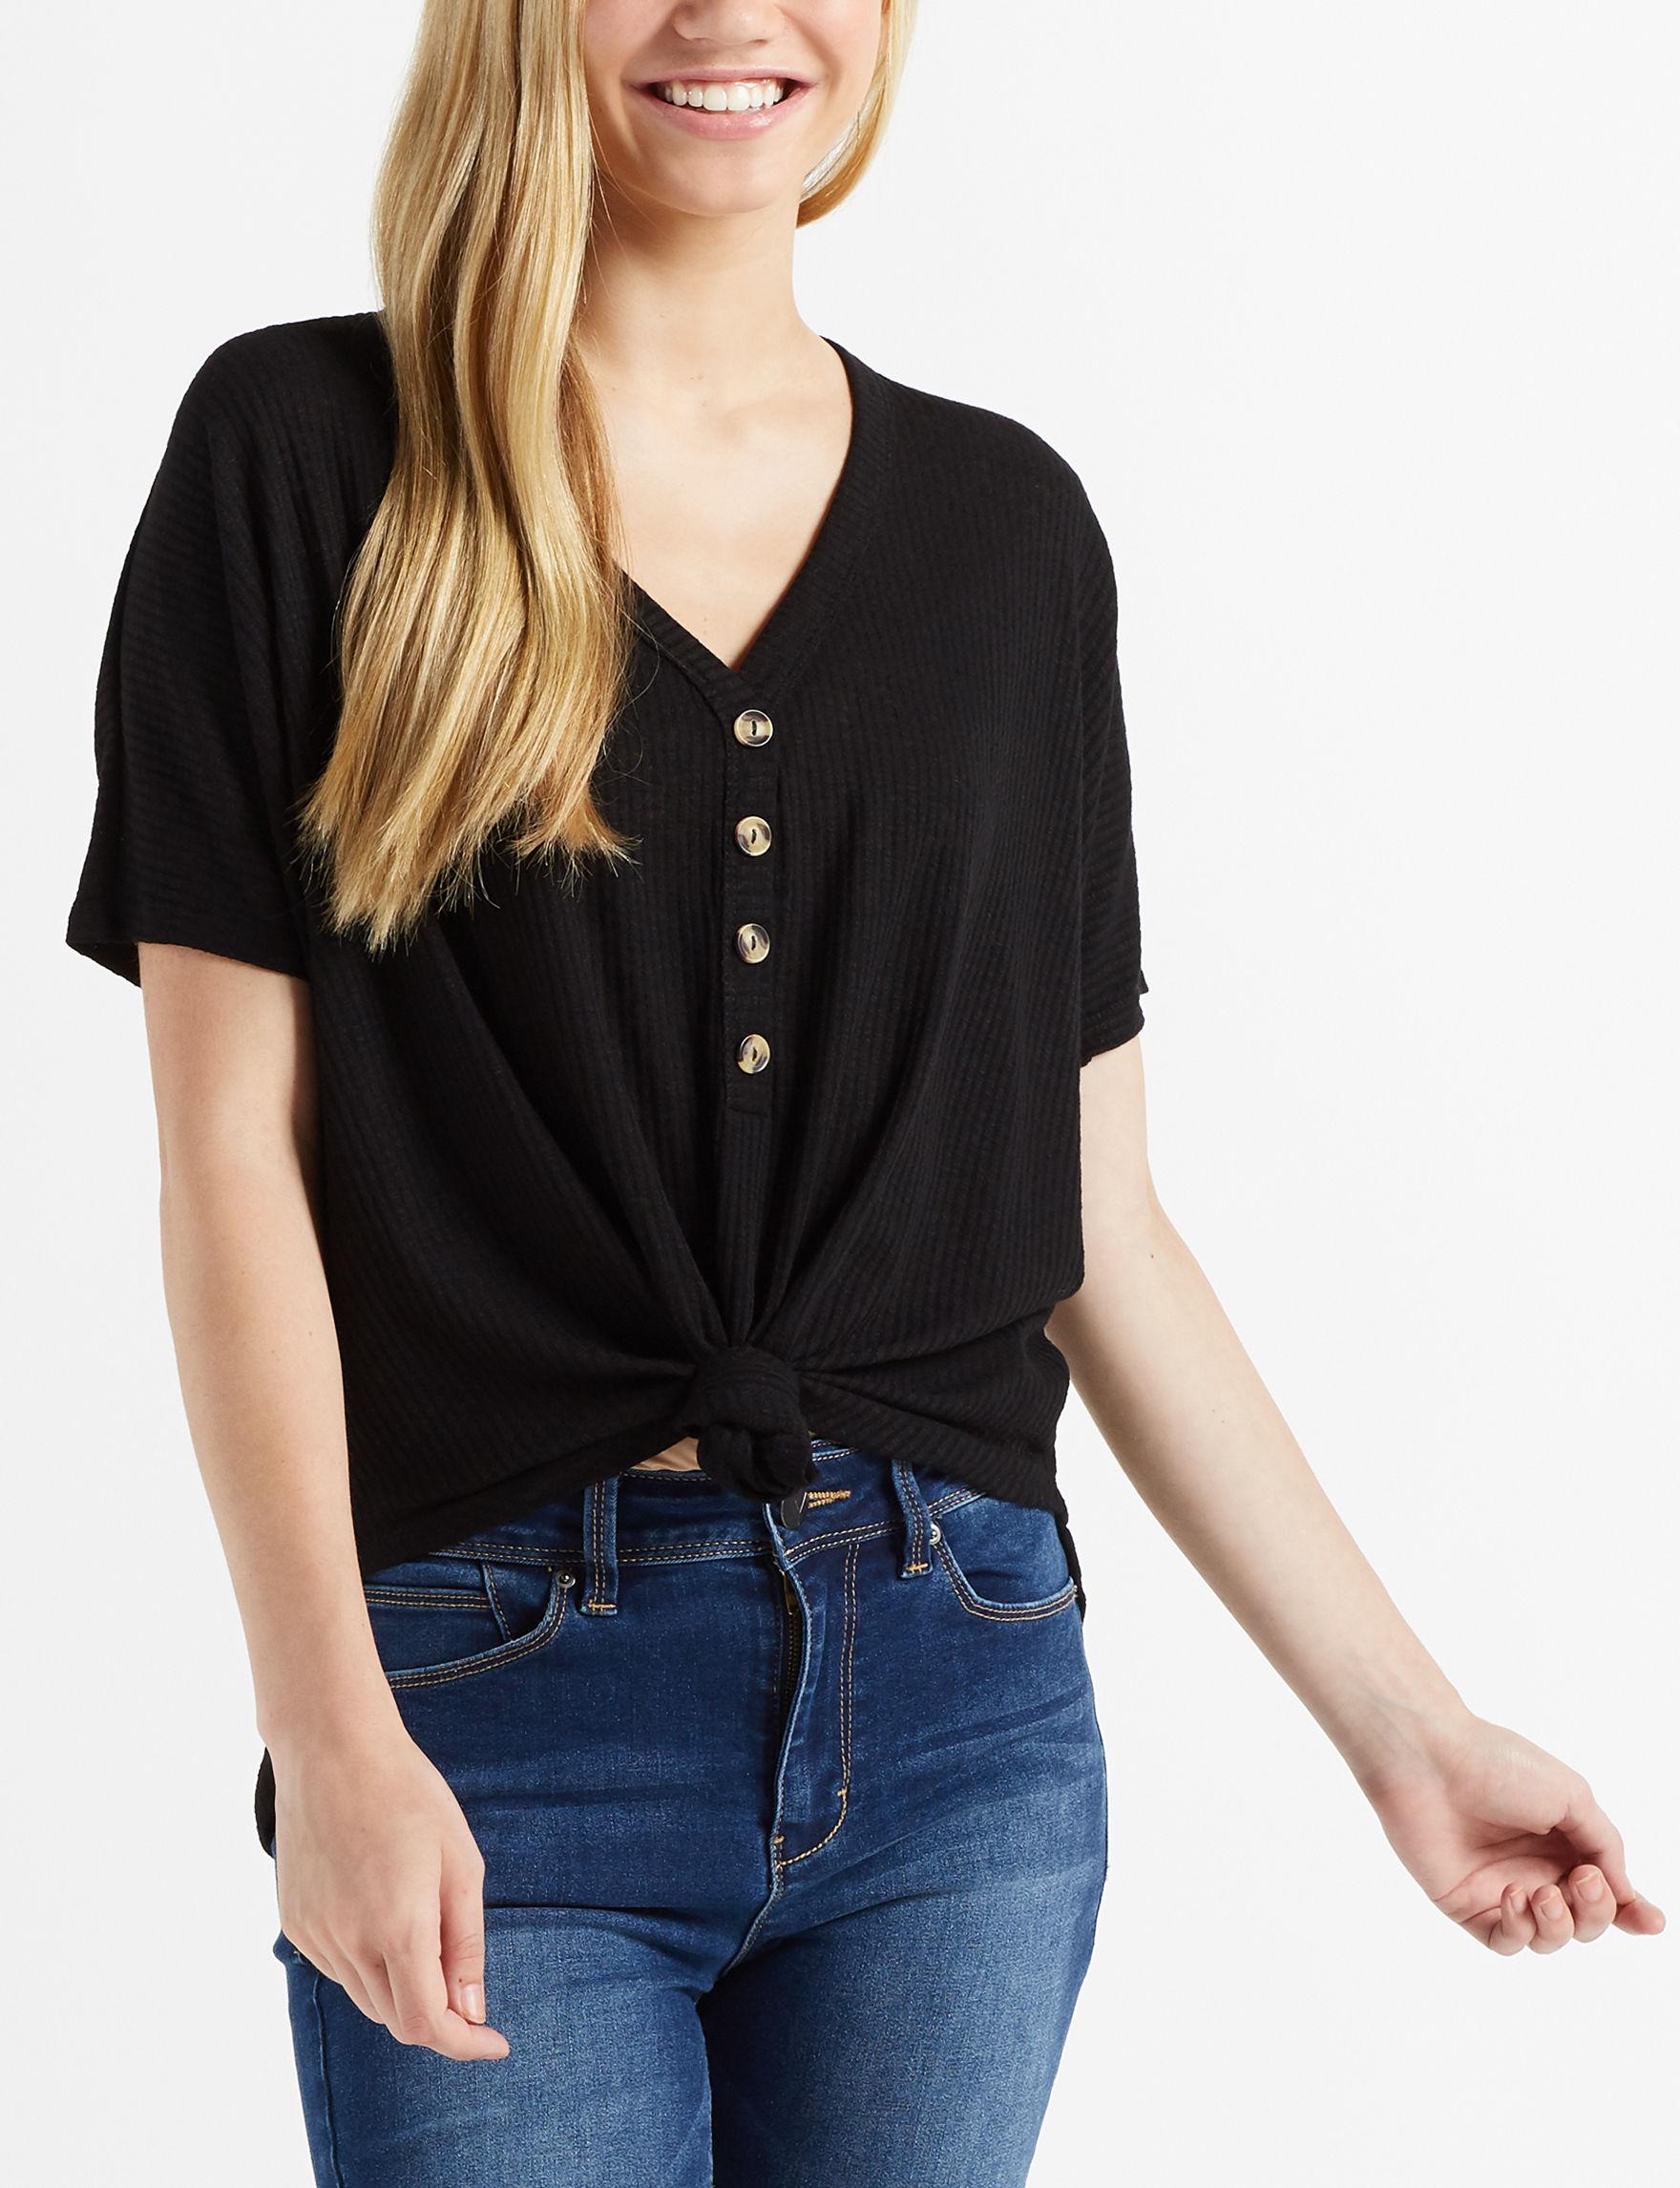 Liberty Love Black Shirts & Blouses